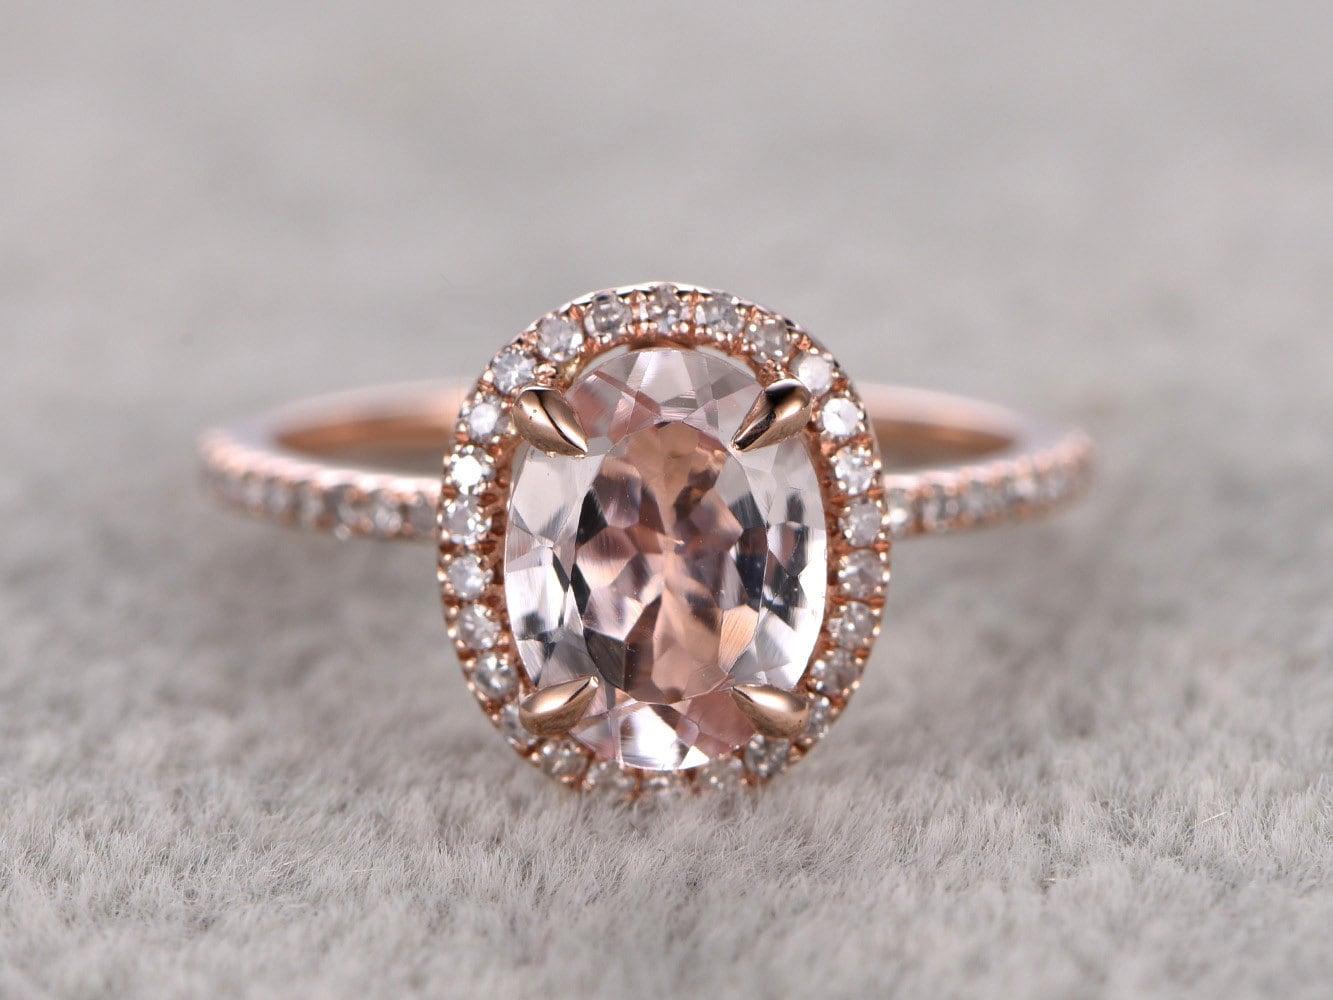 6x8mm morganite engagement ring rose golddiamond wedding. Black Bedroom Furniture Sets. Home Design Ideas